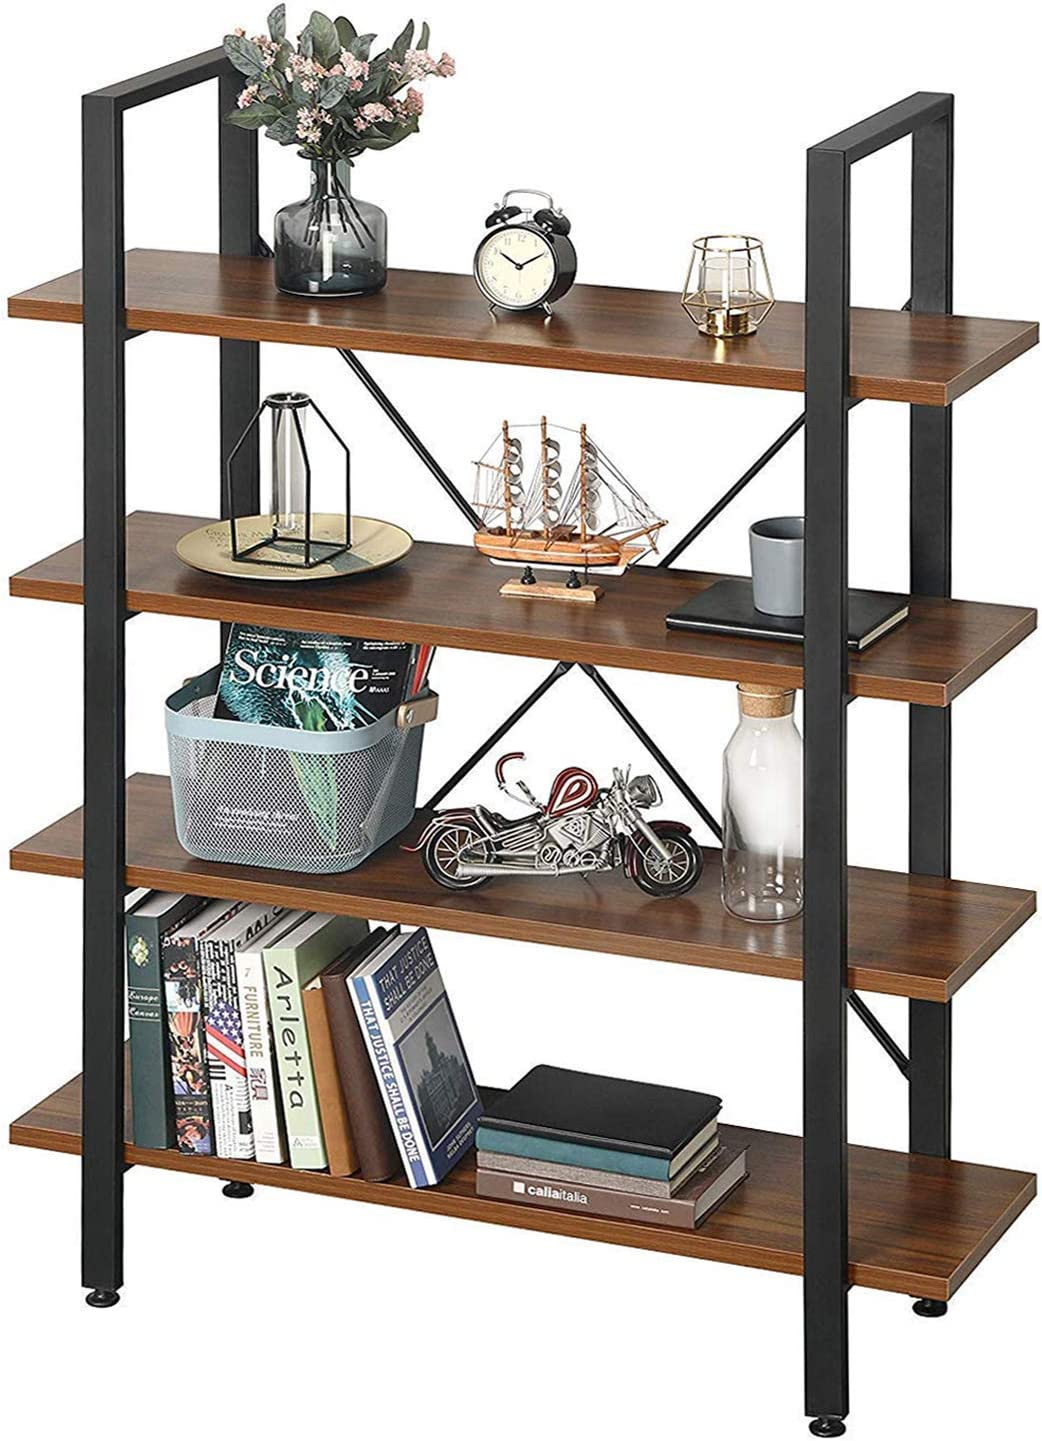 Greenforest Small Bookcase 2 Tiers Storage Shelf Modern Wood Bedroom Bookshelf For Living Room Home Office Walnut Mimbarschool Com Ng